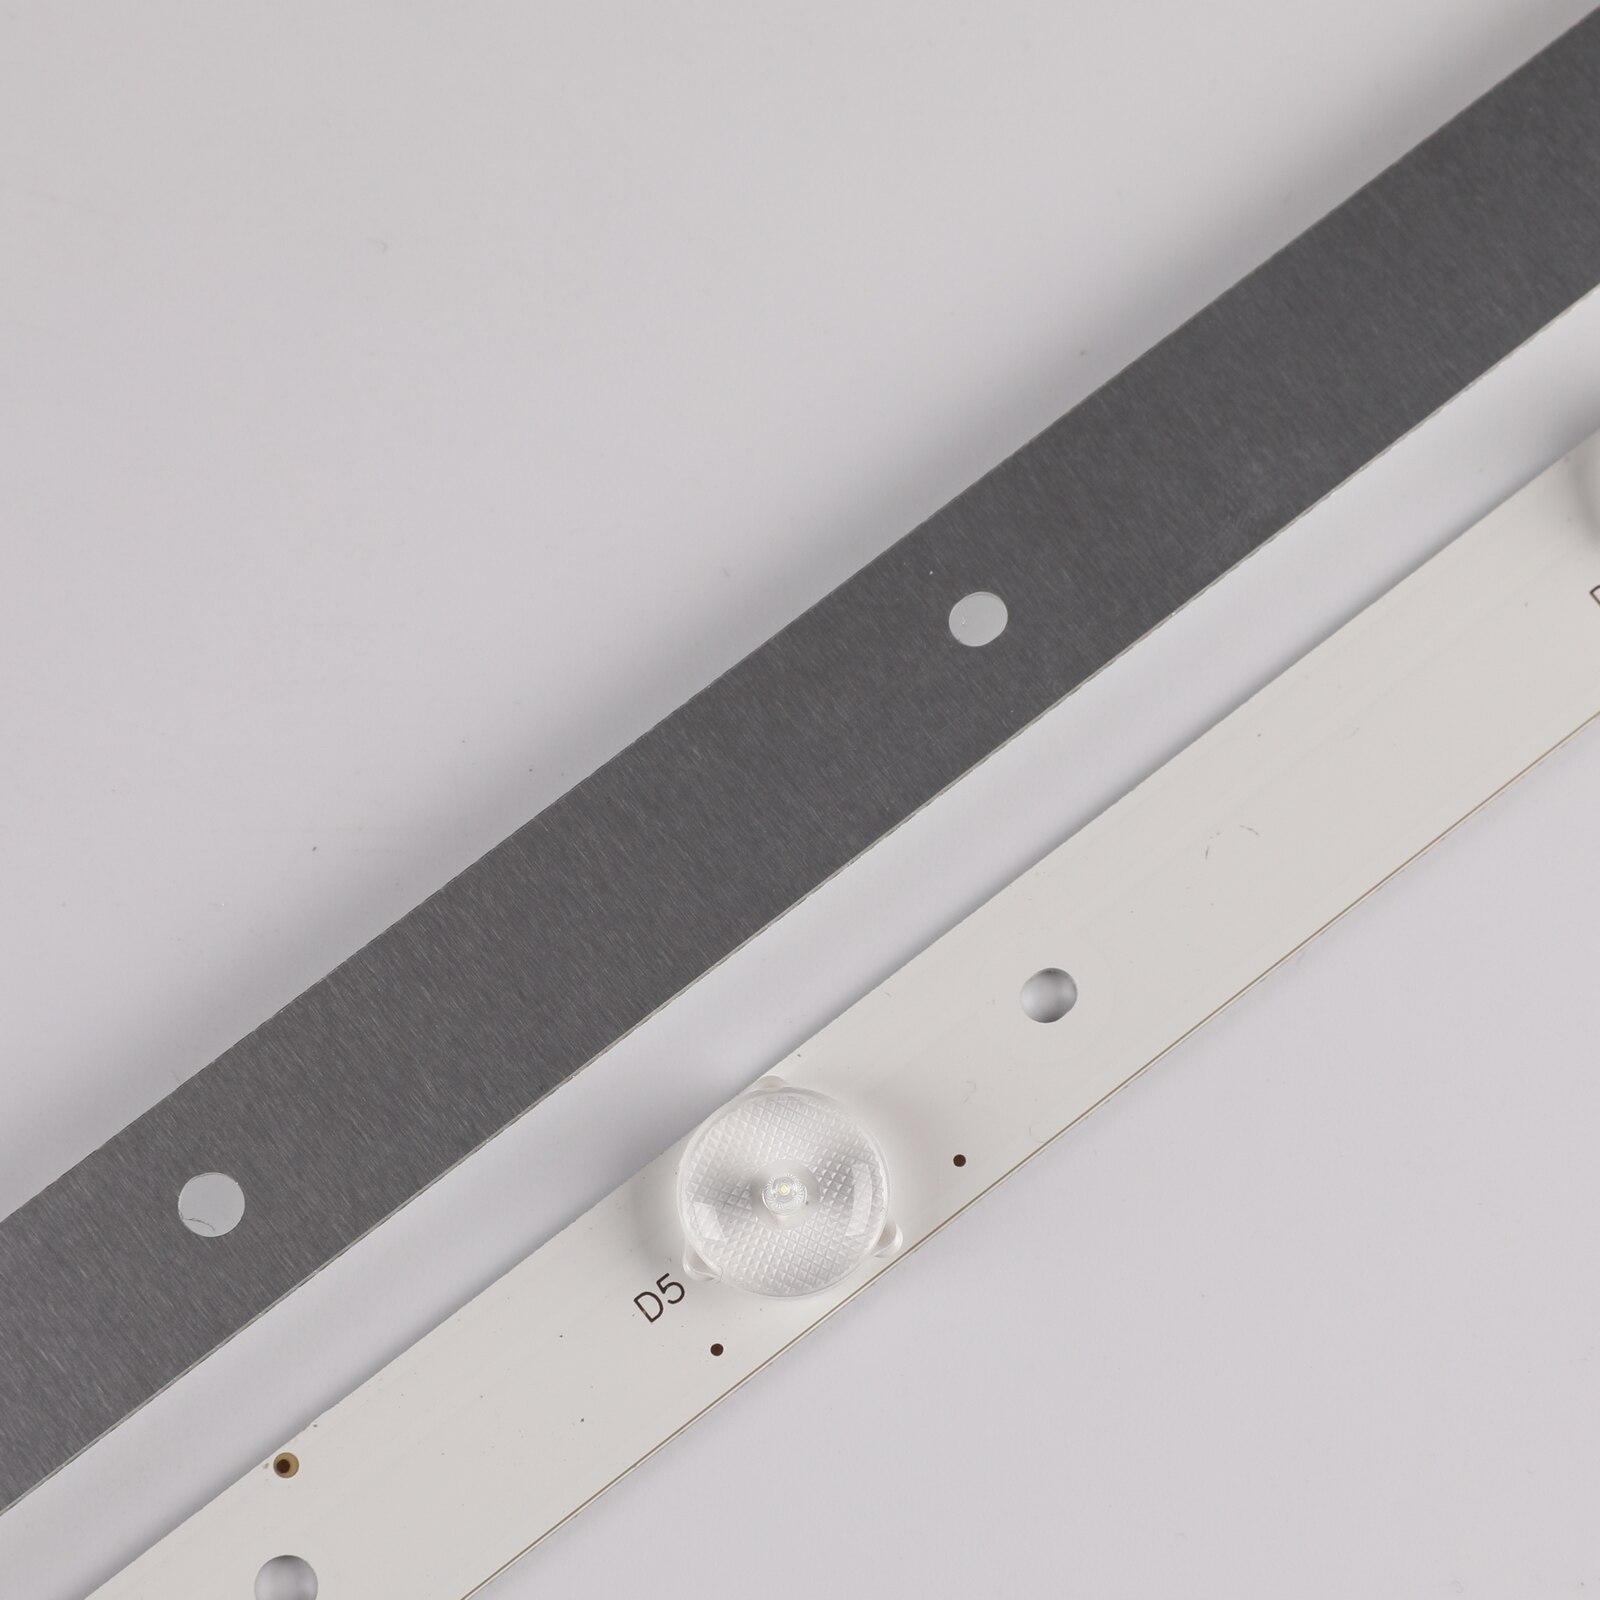 100% New 5pcs/Kit LED strips for HAIER TV 43CH6000 LE43A3300 TPT430H3 DUYSHA LB PF3528 GJD2P5C435X10 H LB PF3528 GJD2P5C435X10 B enlarge